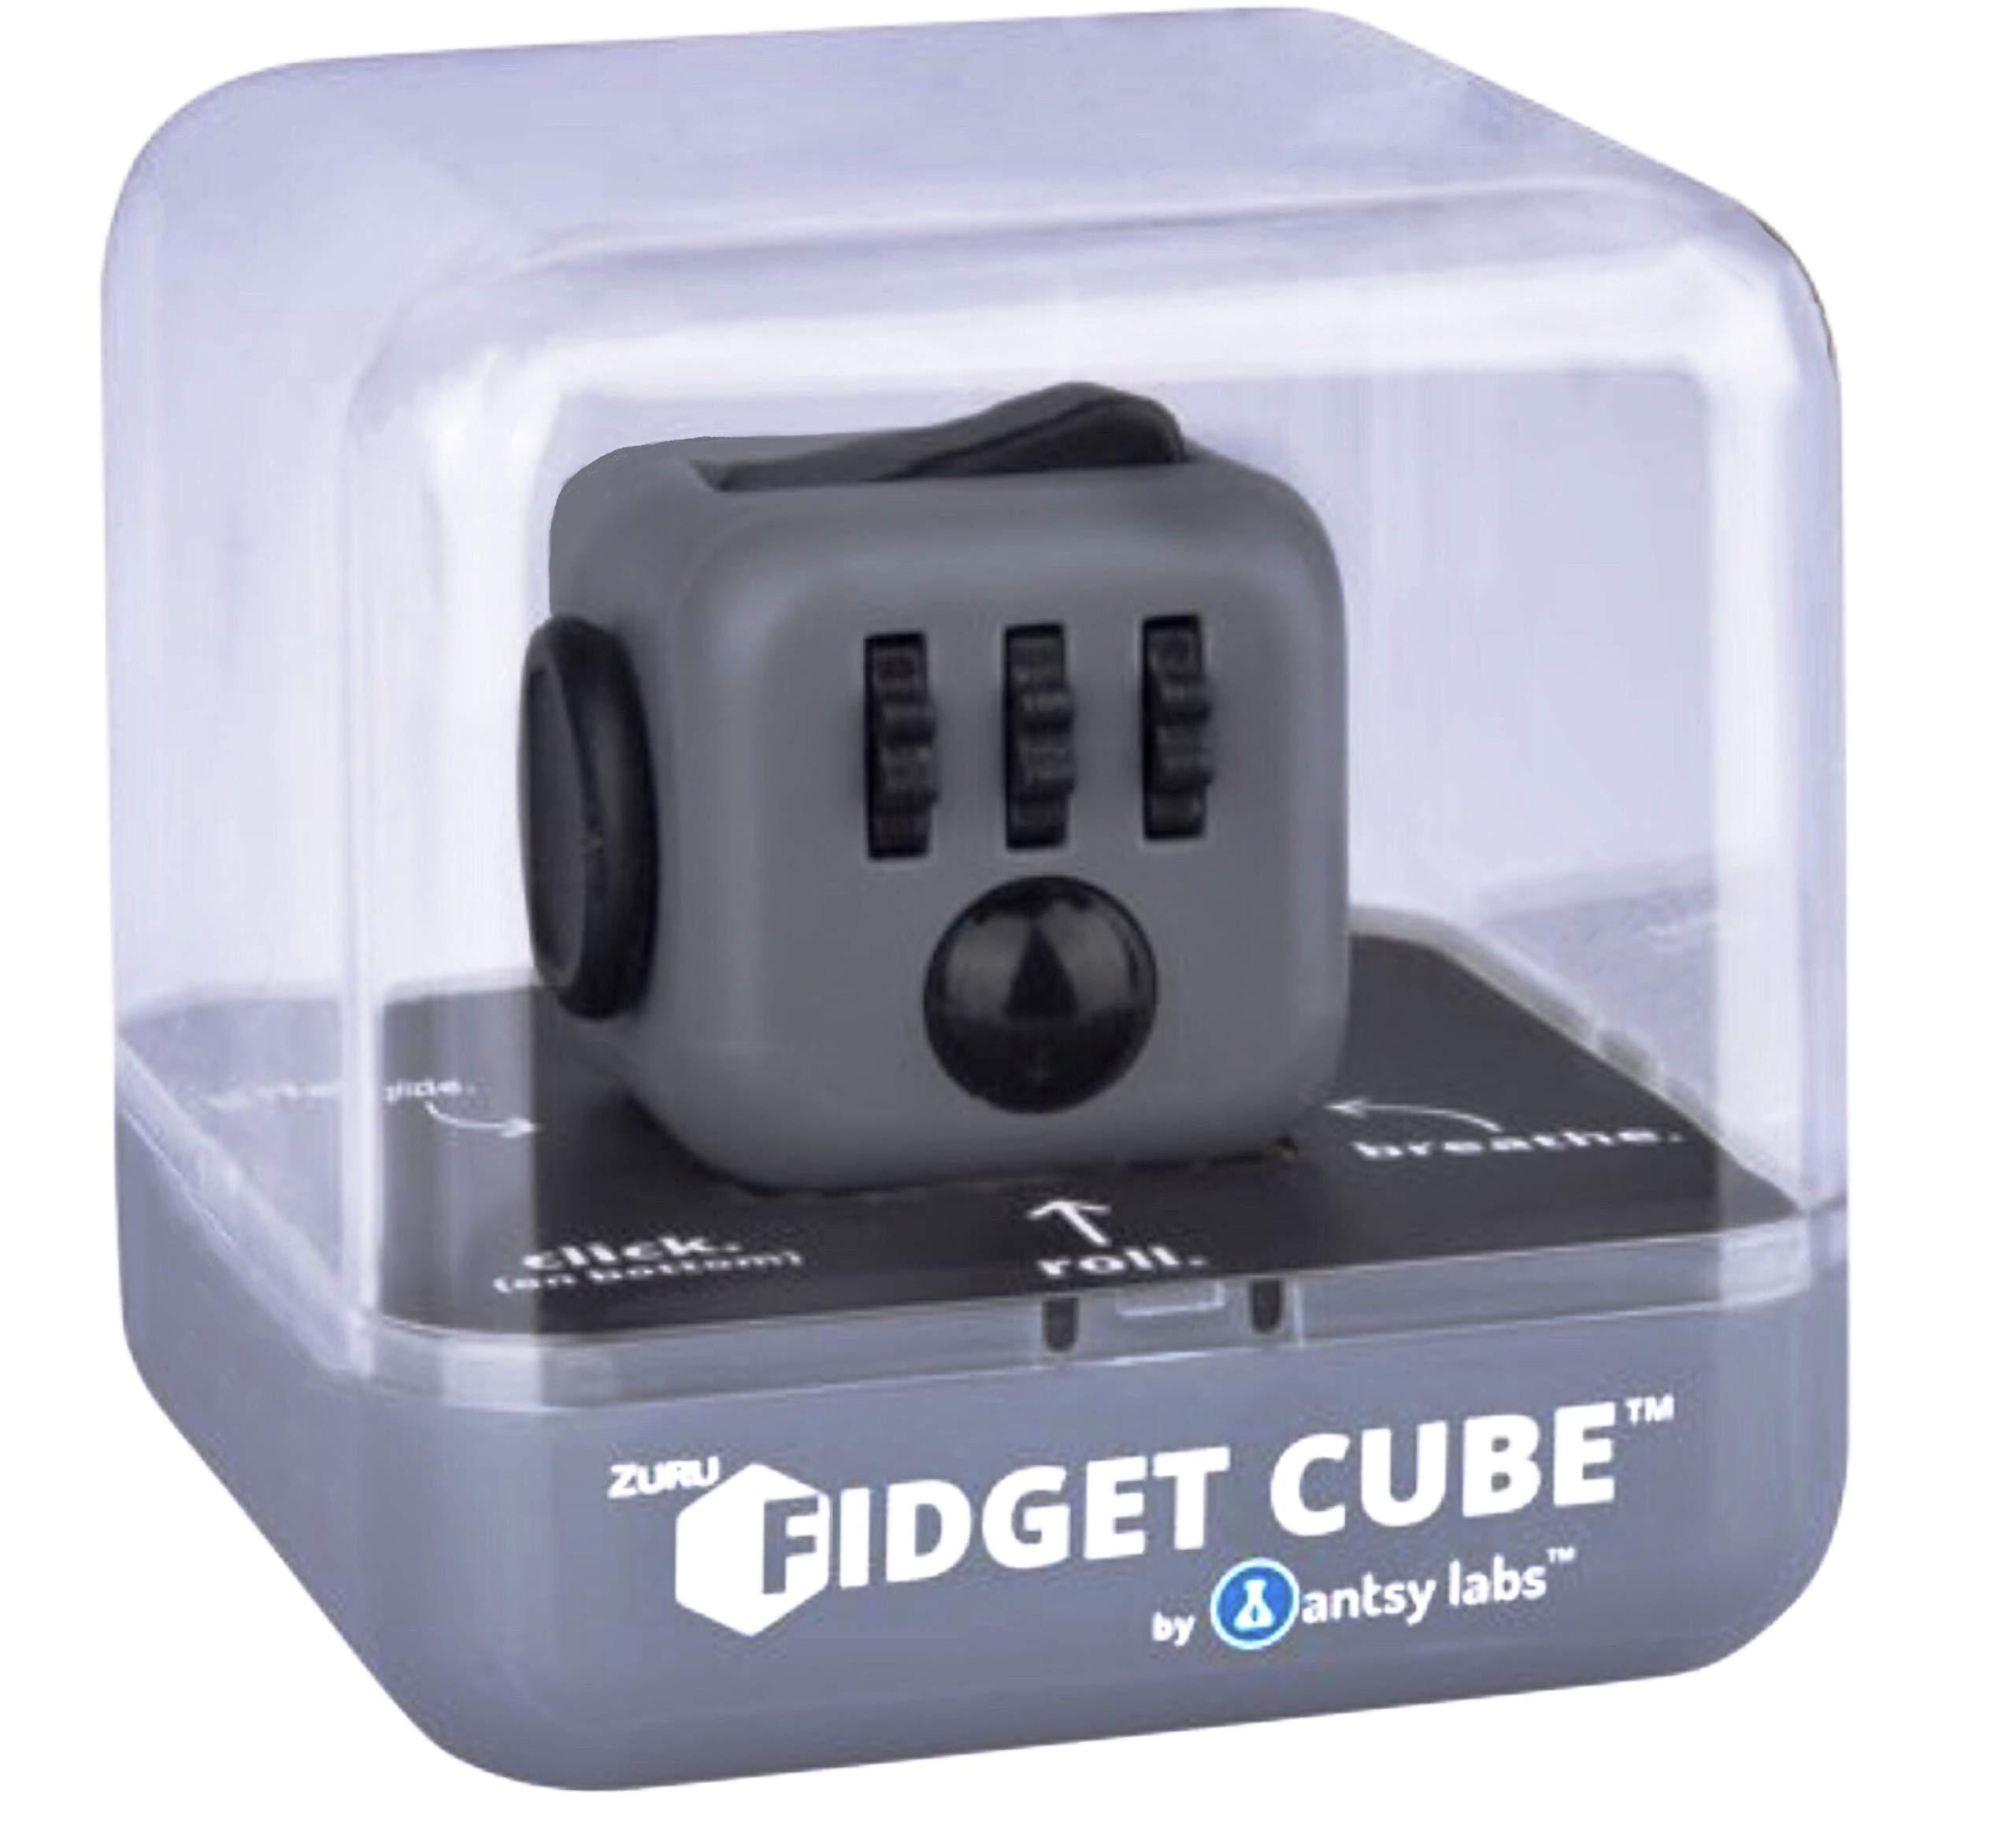 Zuru Fidget Cube by Antsy Labs - Graphite Grey Fidget Cube with Black Accents by ZURU